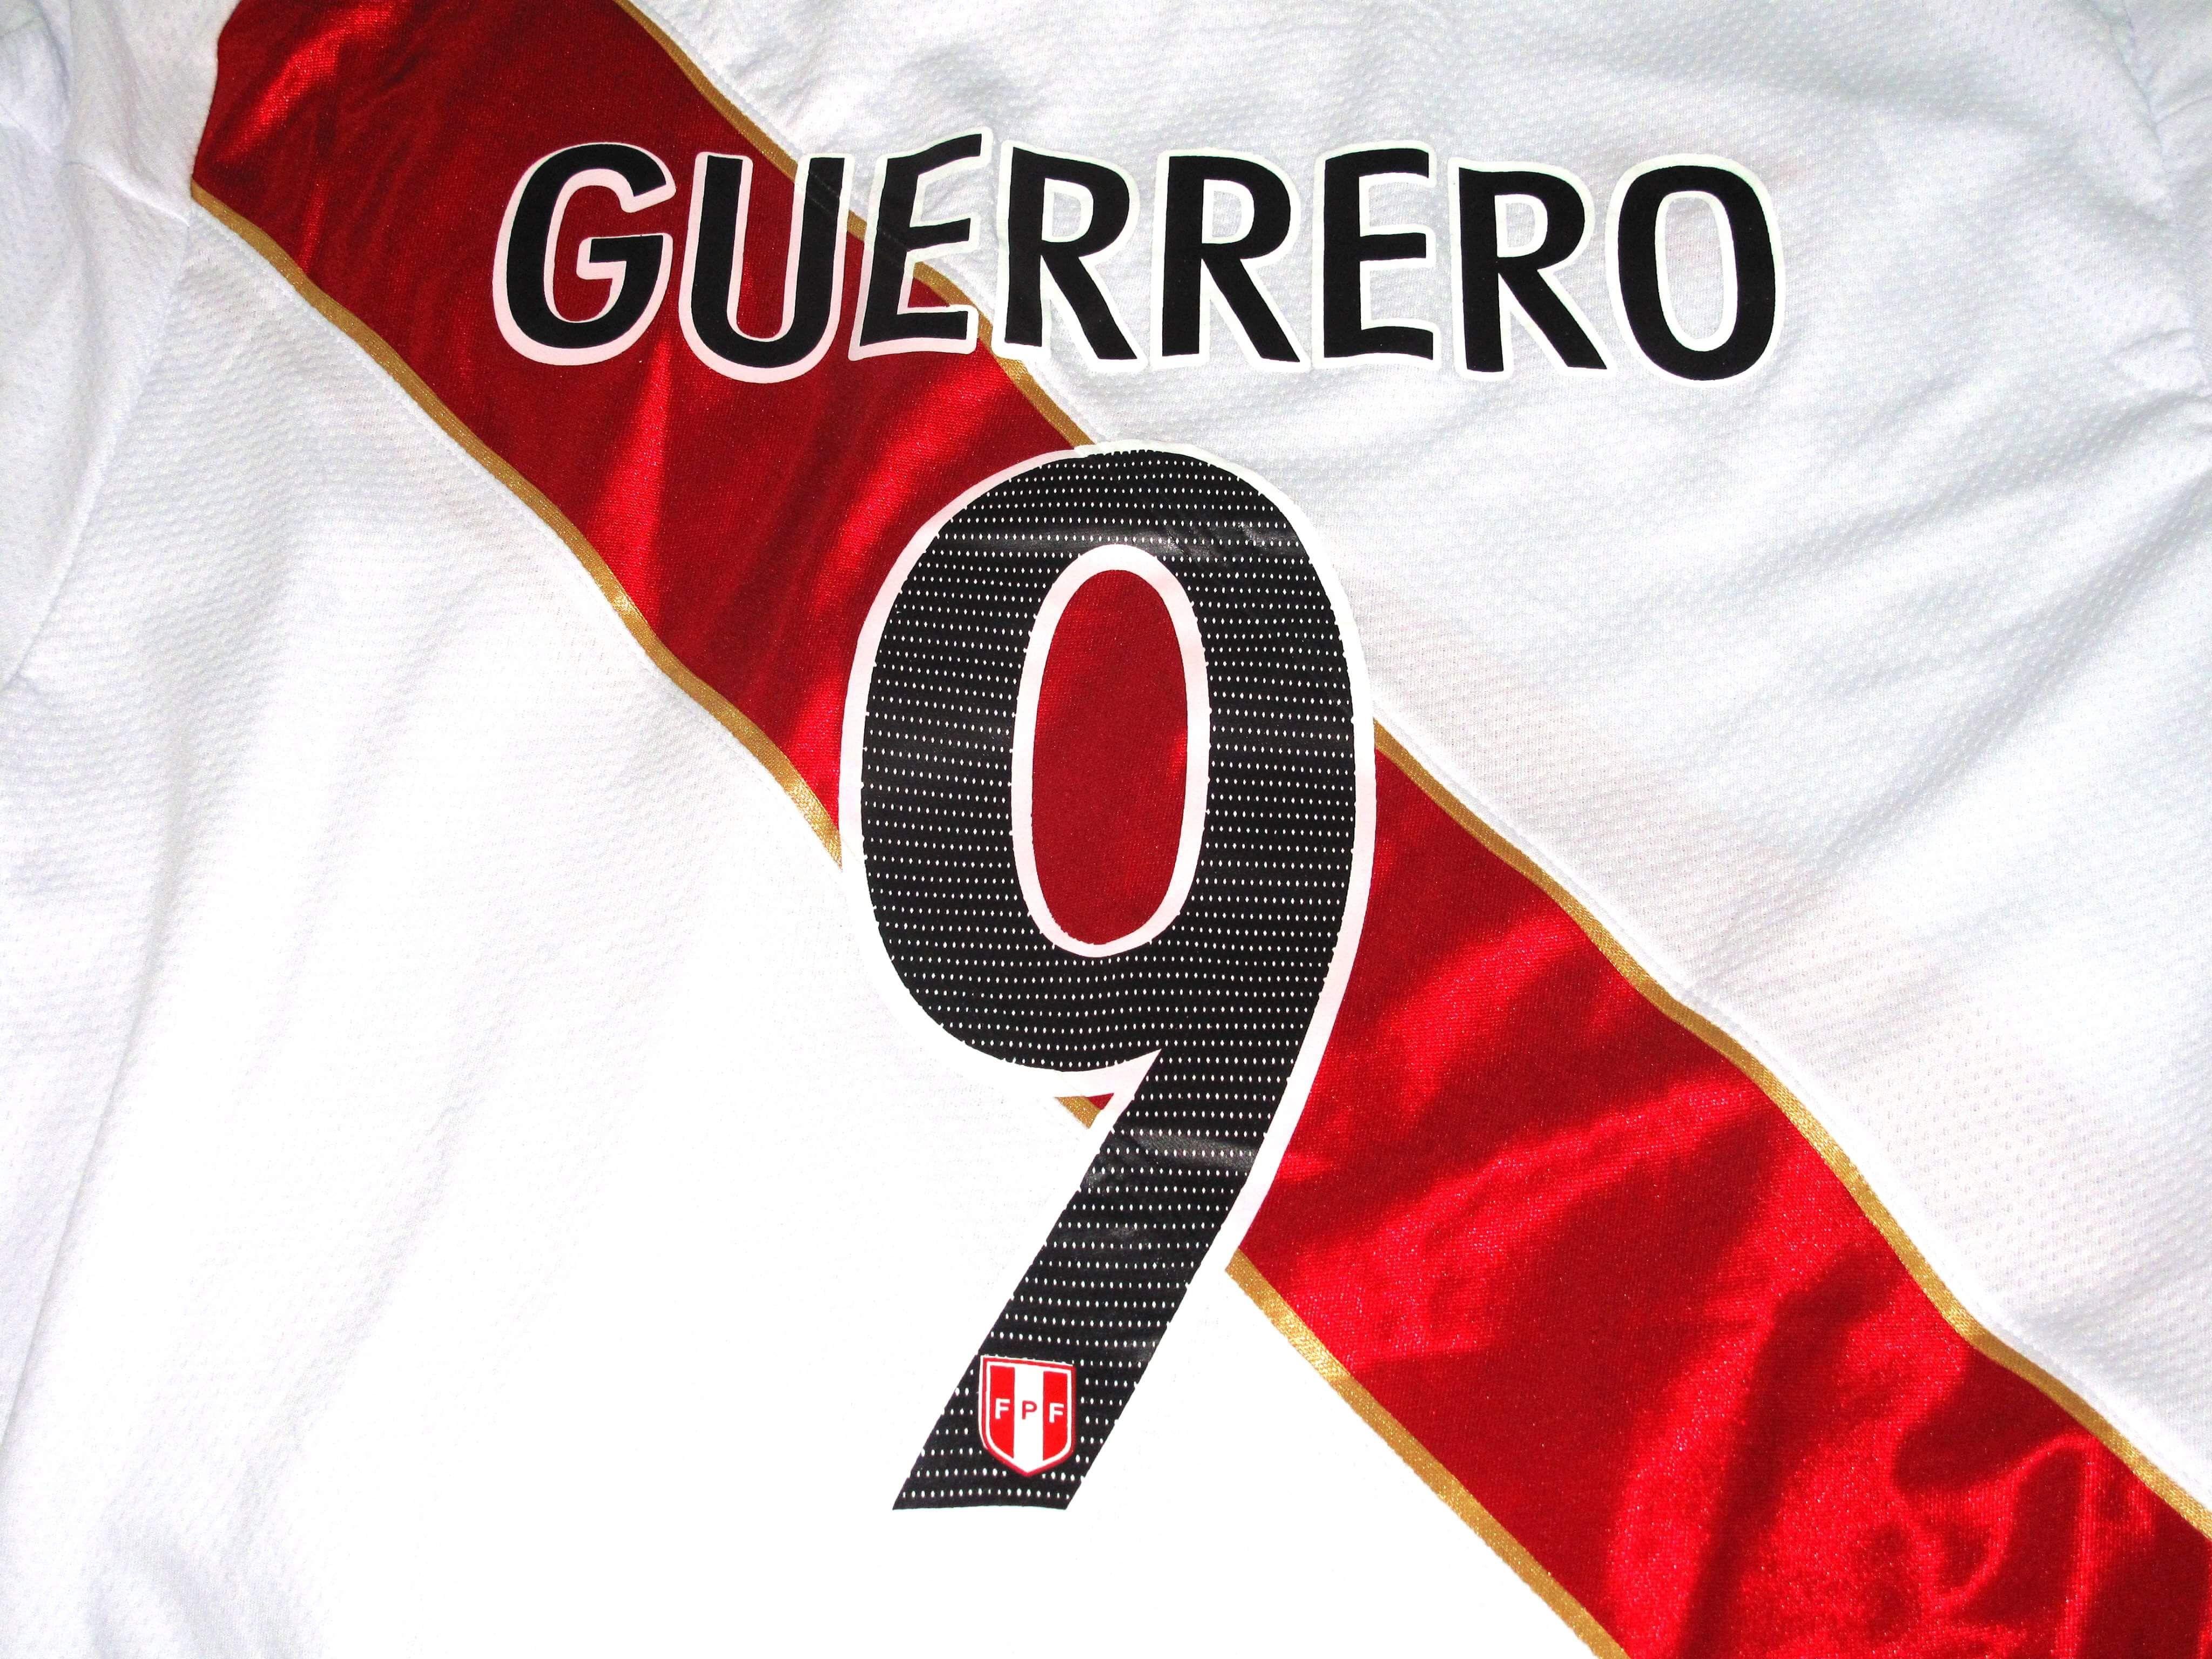 483a6c616 Peru national team soccer jersey world cup russia 2018 guerrero 9 xl ...